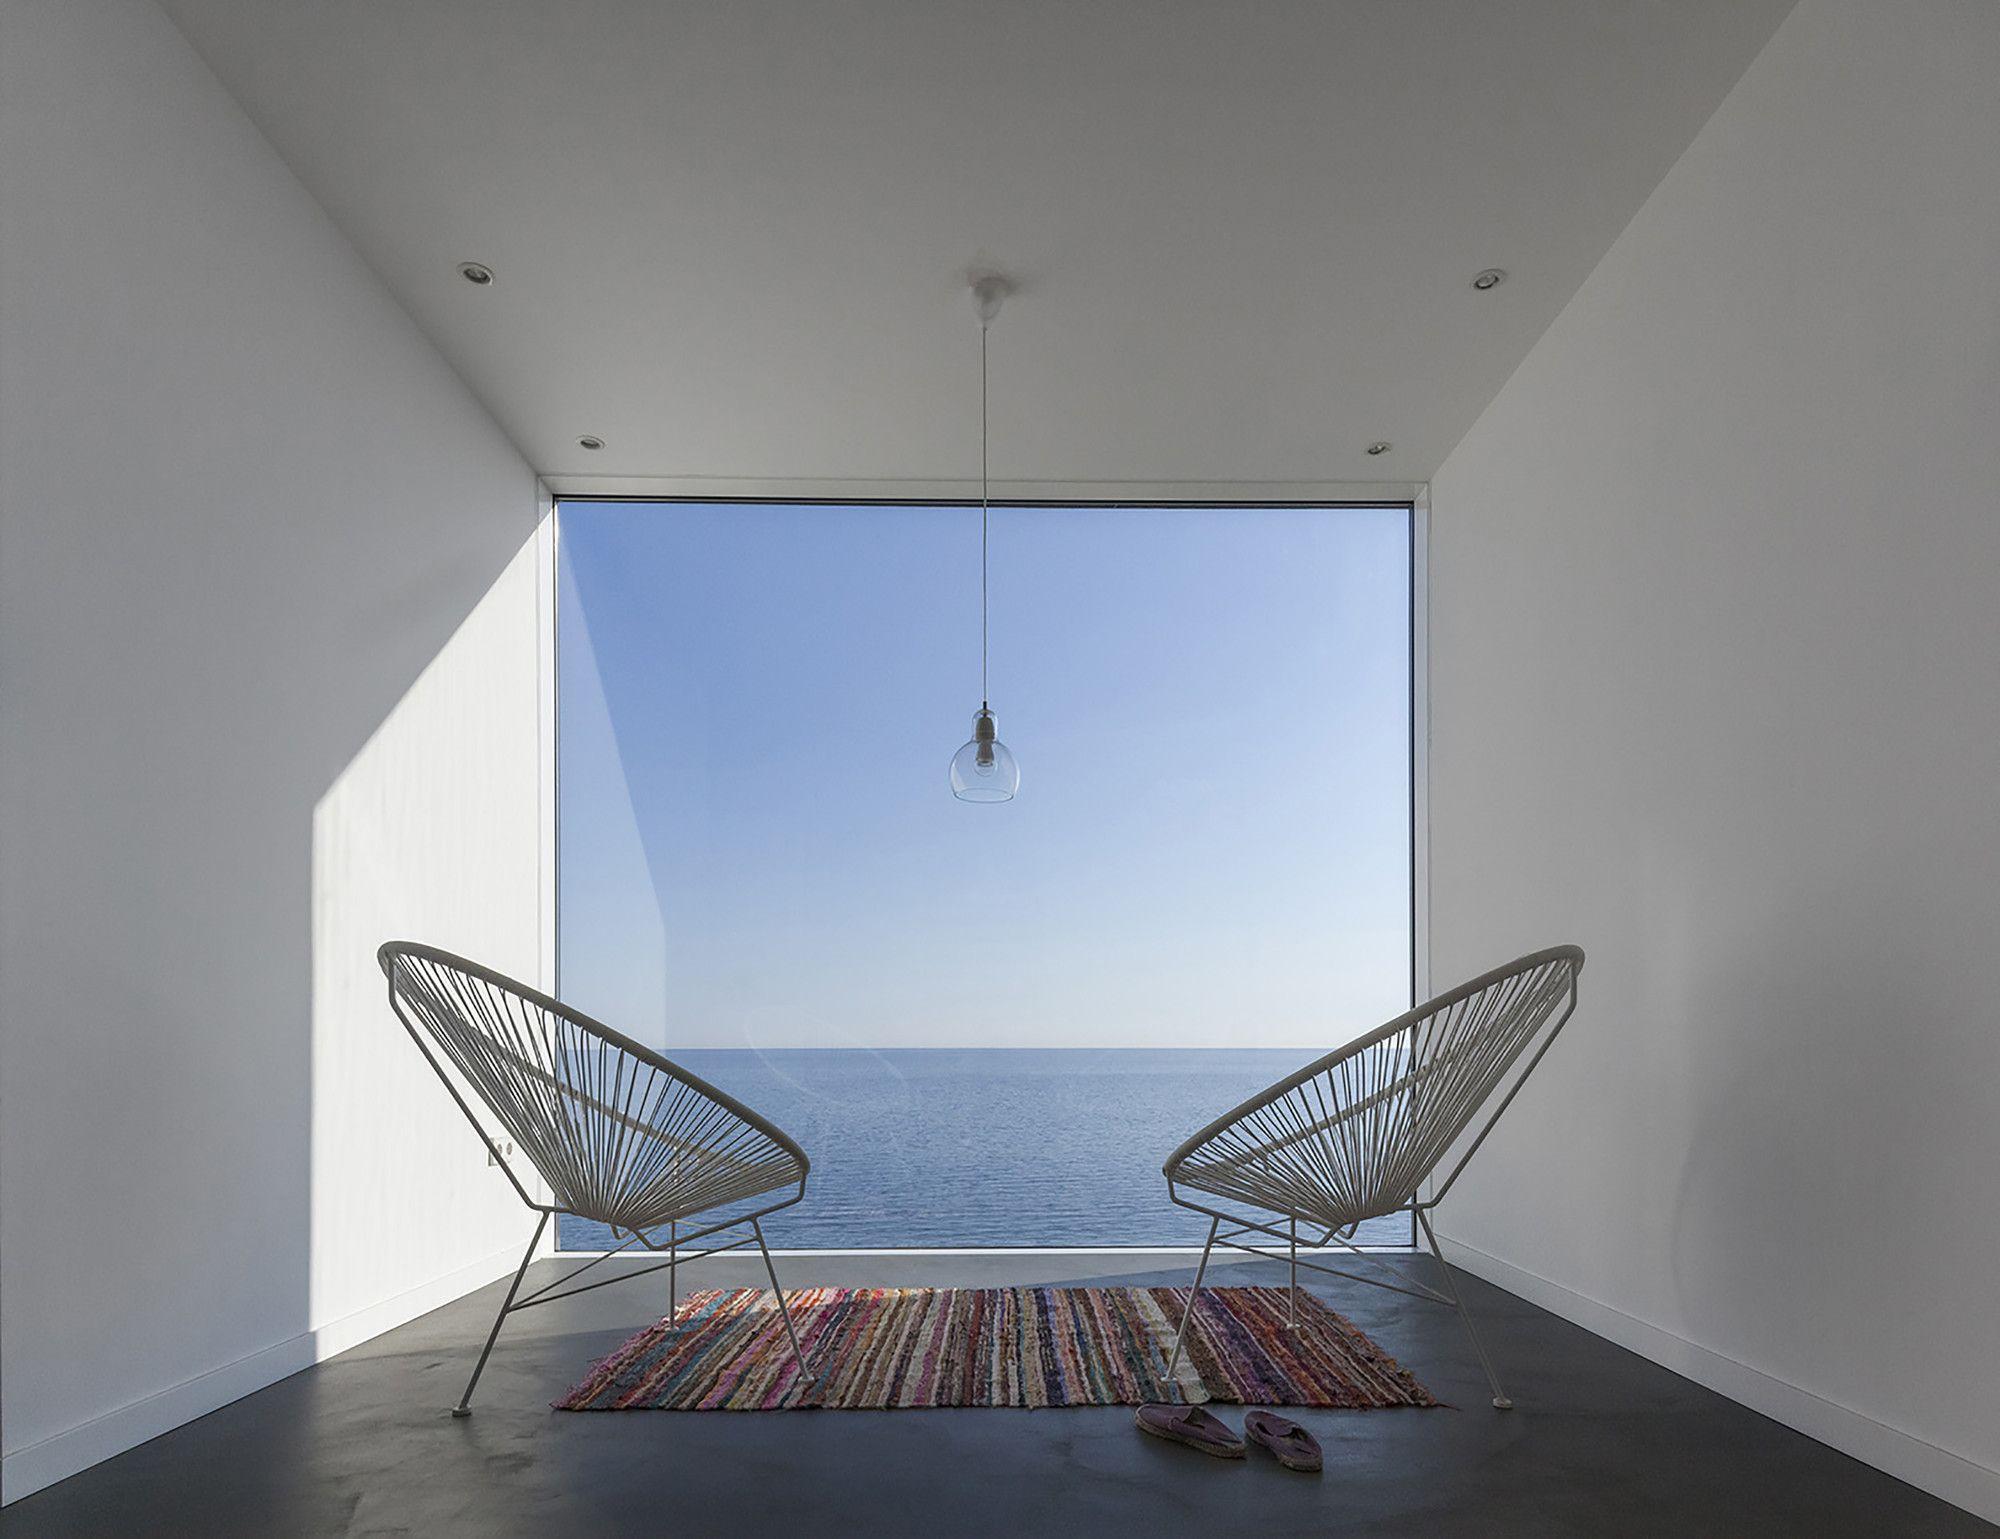 Galería de Casa Girasol / Cadaval & Solà-Morales - 4